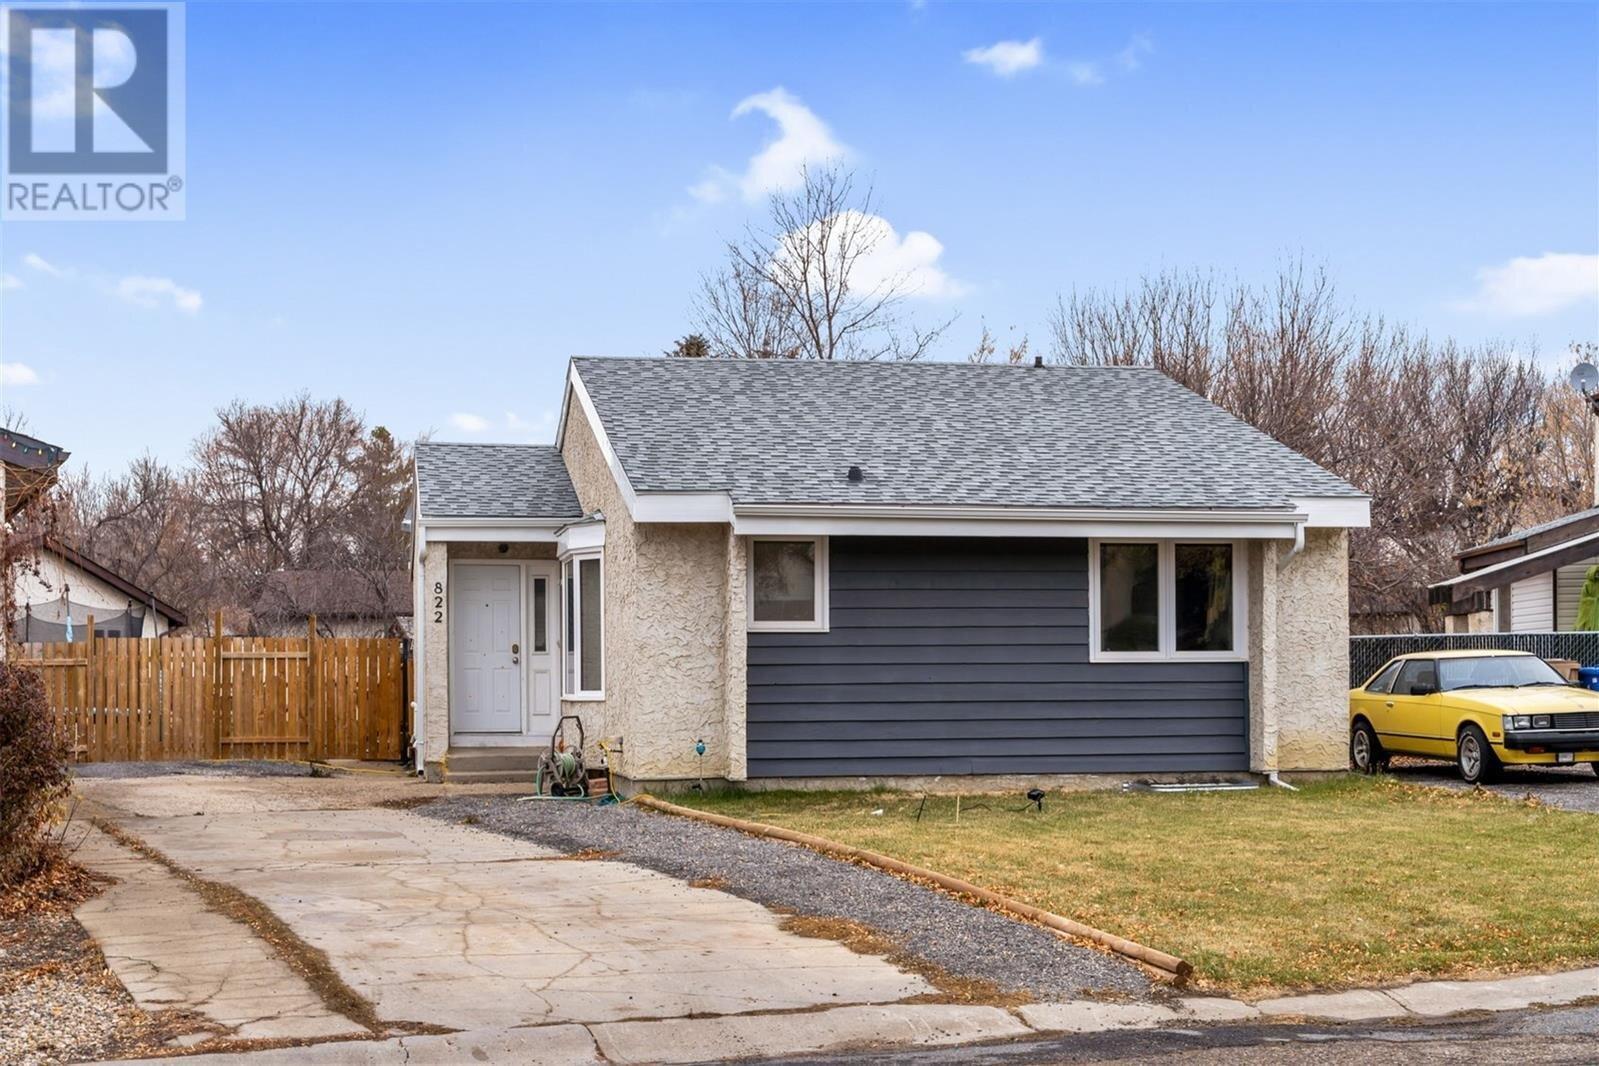 House for sale at 822 Athlone Ct N Regina Saskatchewan - MLS: SK831730